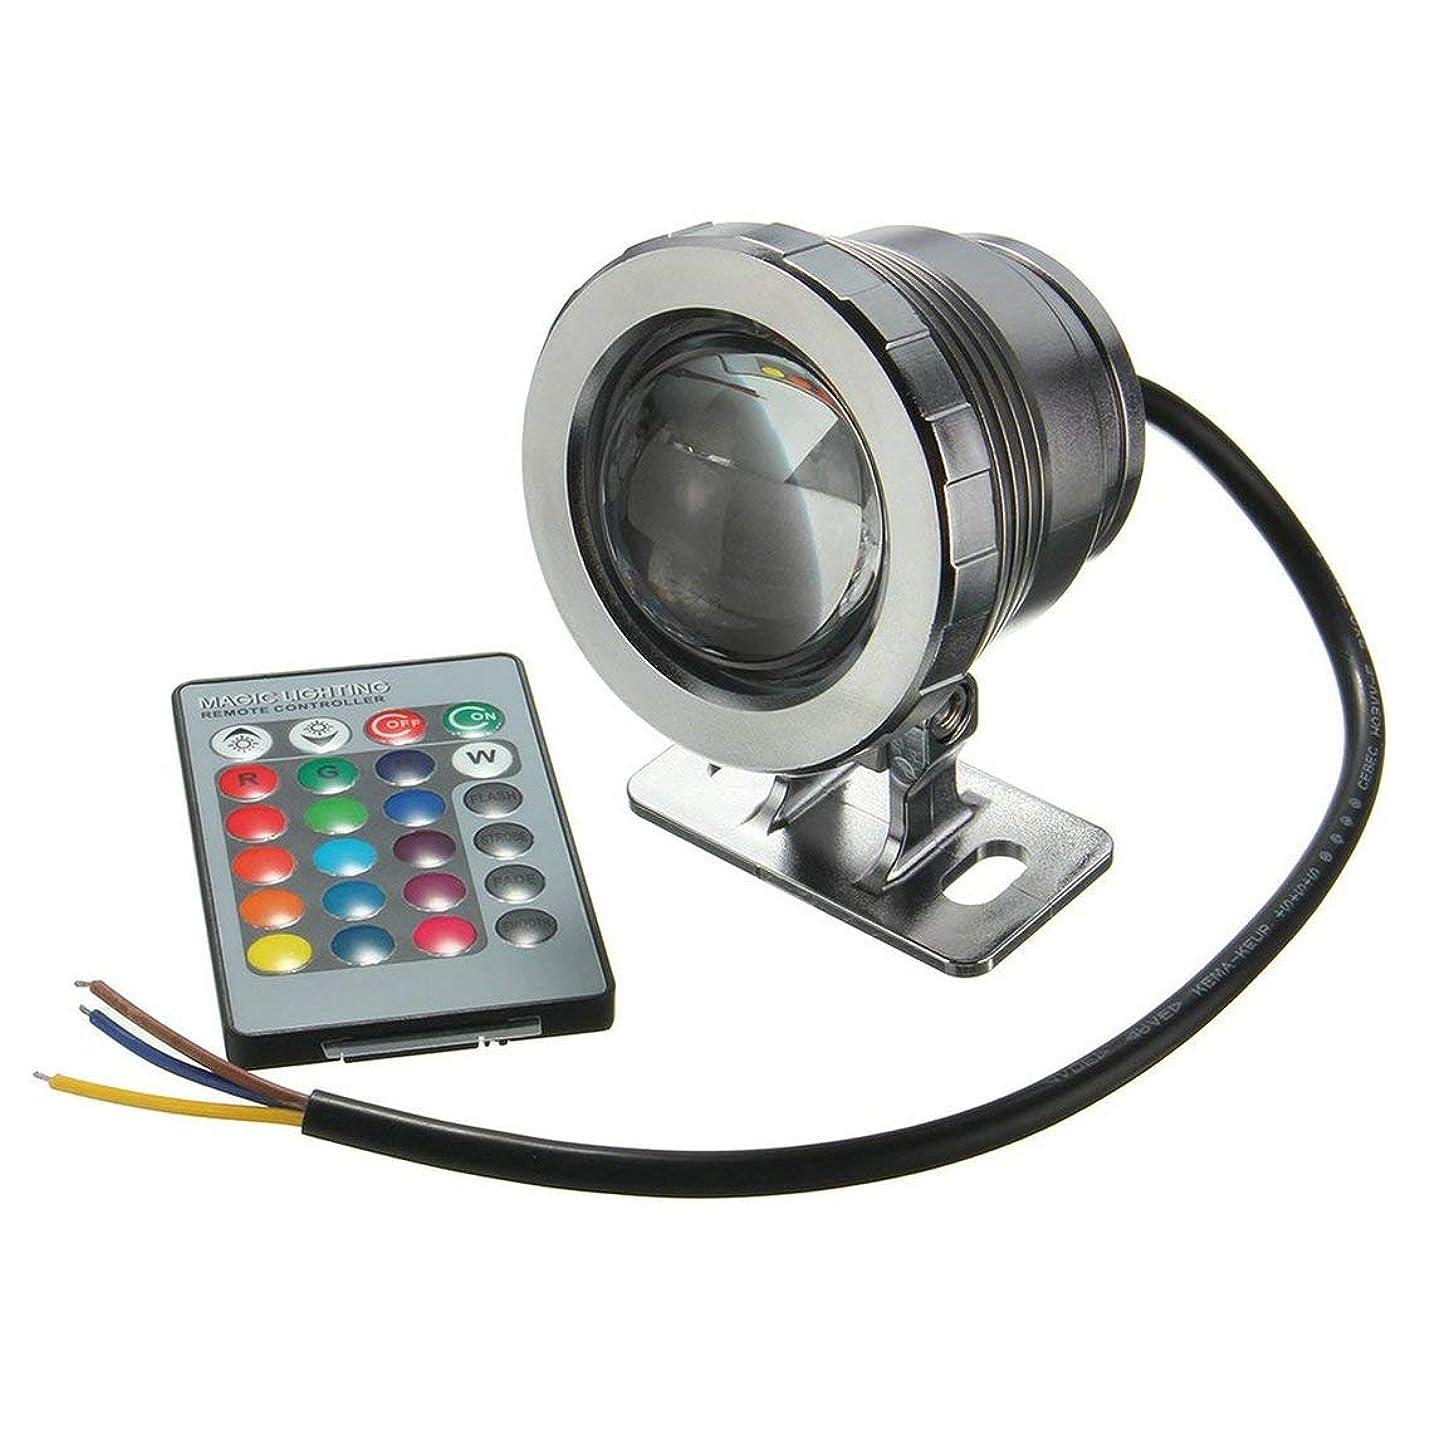 YXTFN Waterproof 10W RGB LED Light Fountain Pool Pond Spotlight Underwater Light